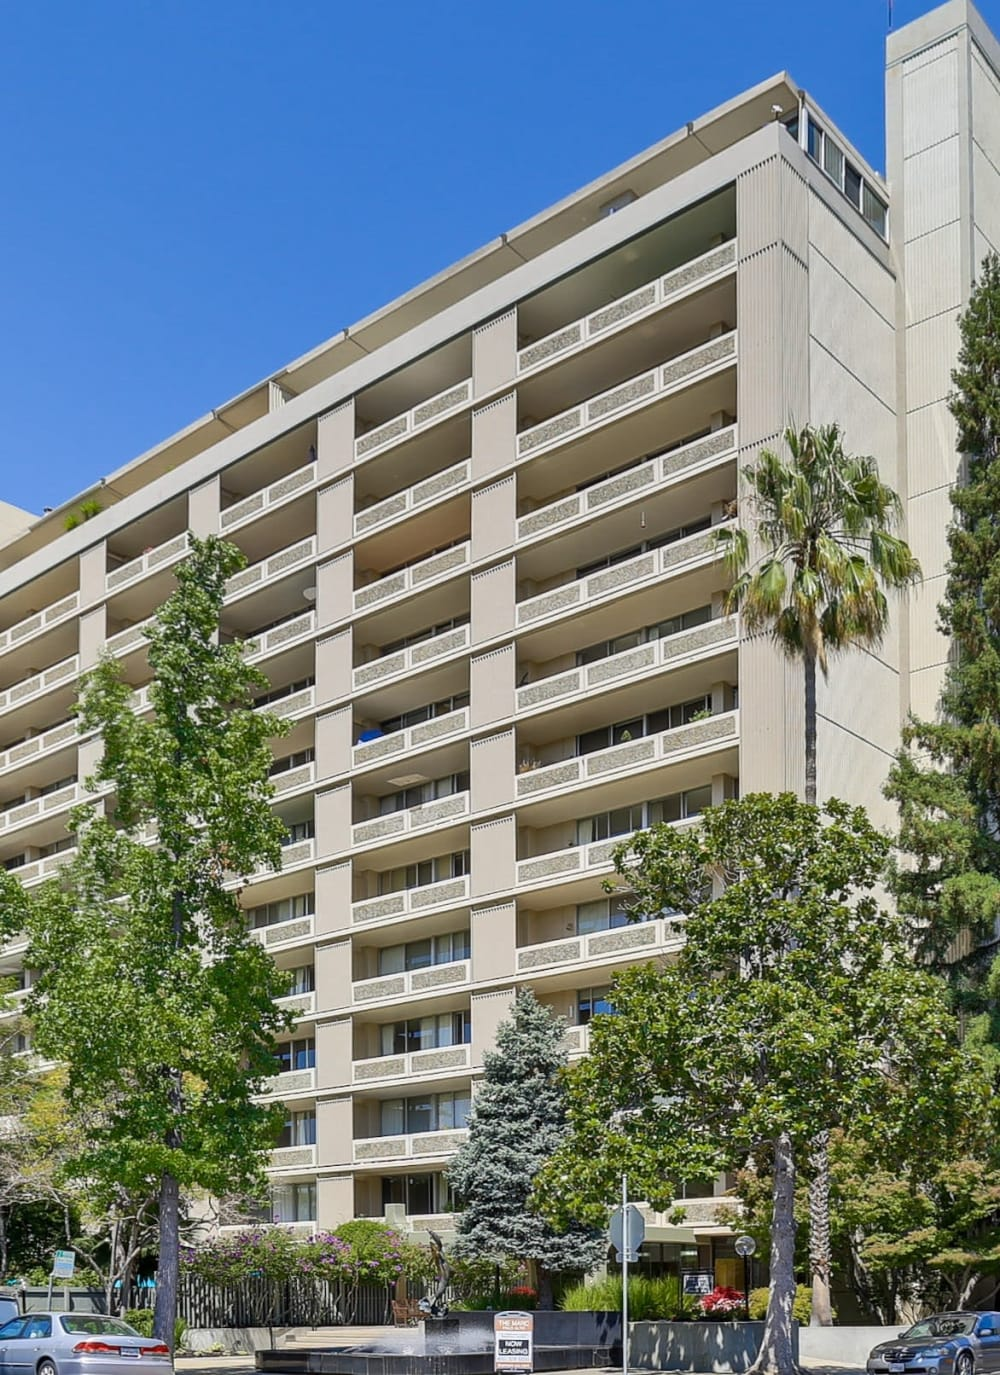 Exterior of high-rise apartments at The Marc, Palo Alto in Palo Alto, California